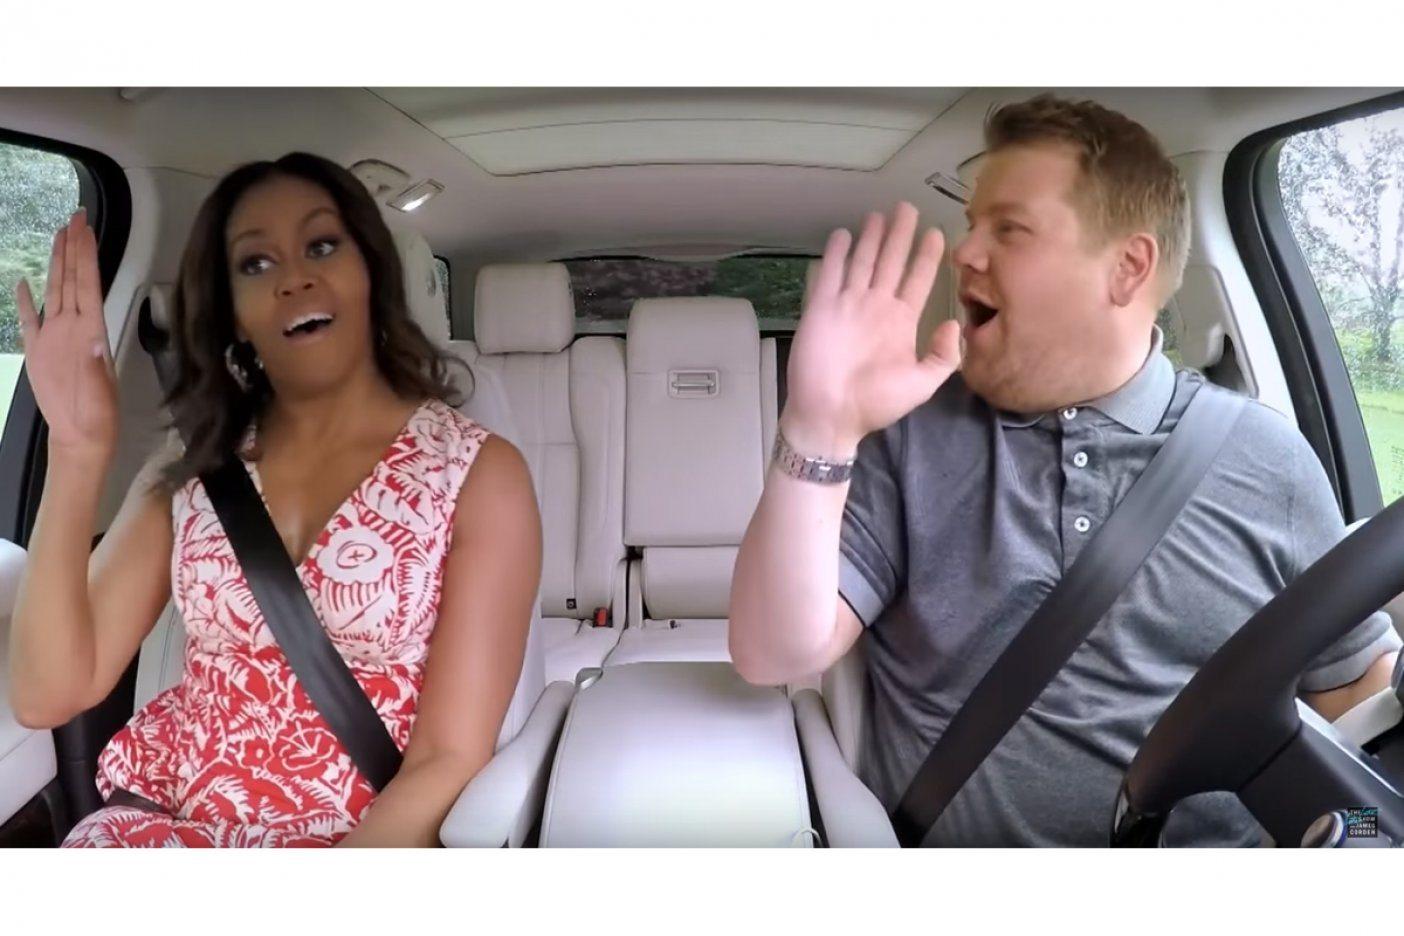 Michelle Obama se sube al 'Carpool Karaoke' y canta himno feminista